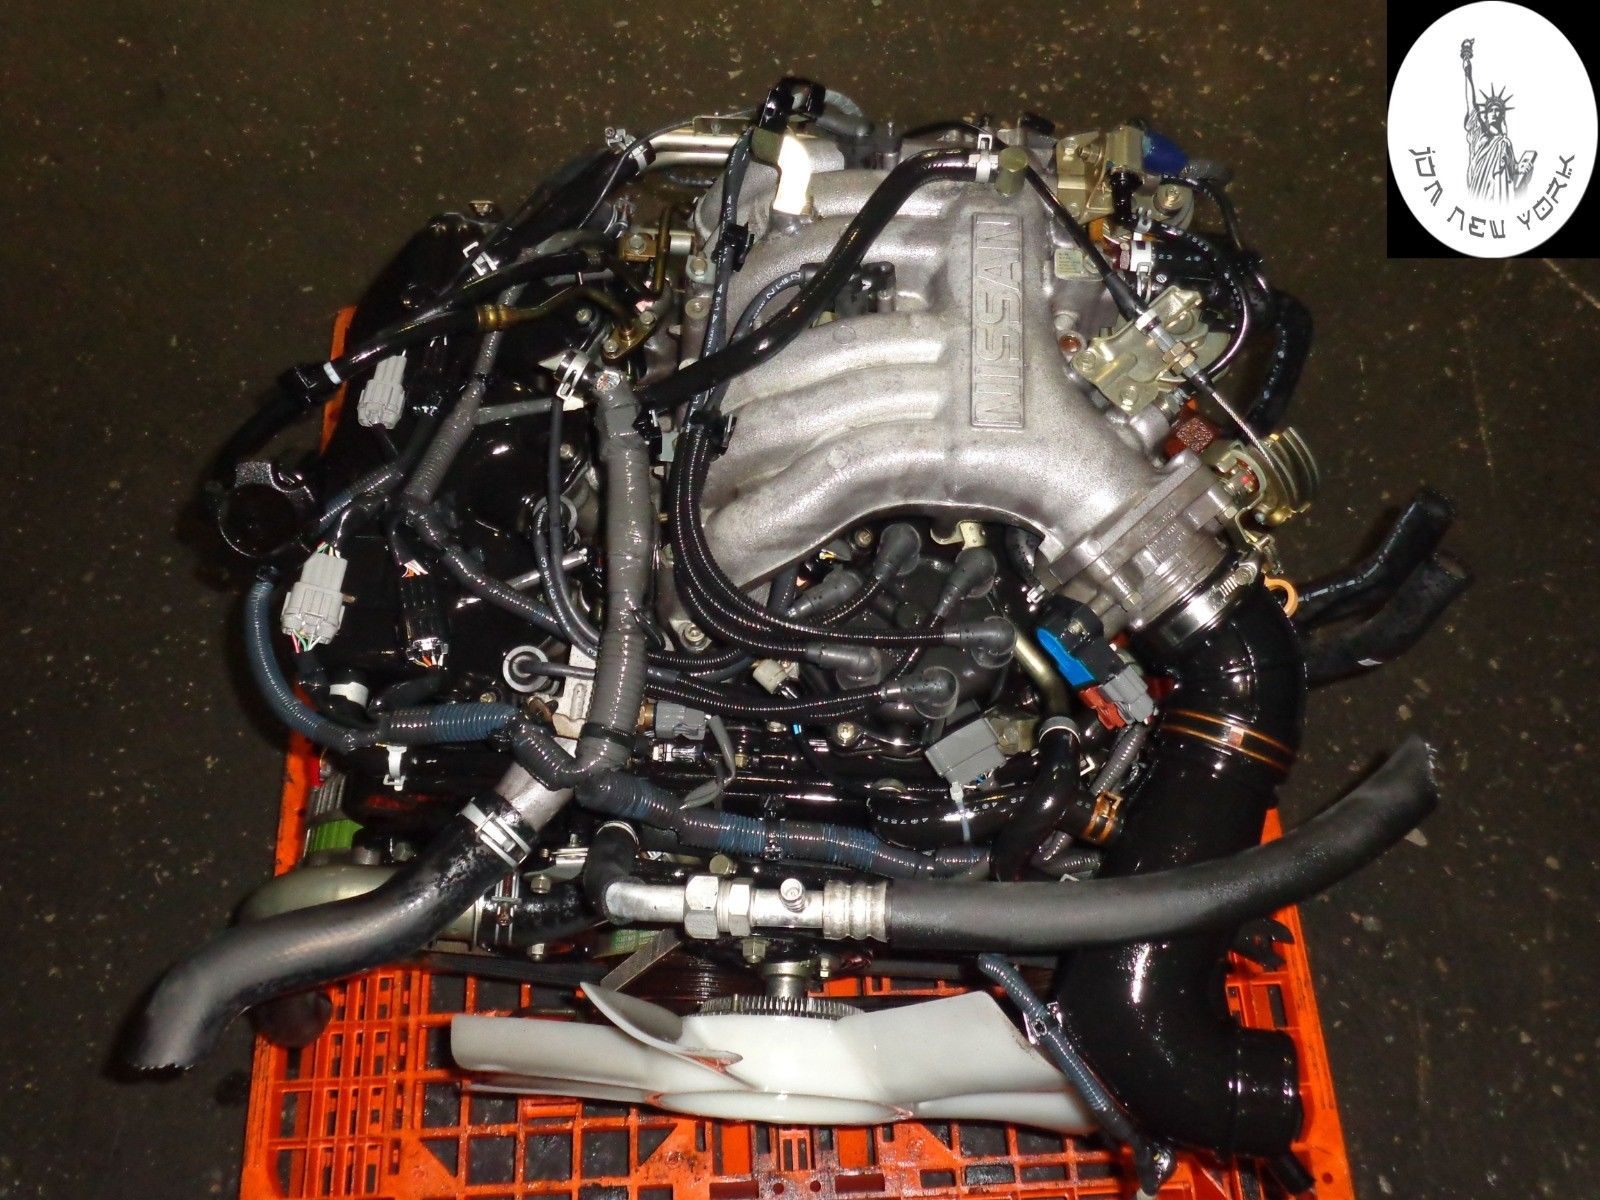 1996 2000 nissan pathfinder 3 3l sohc v6 engine jdm vg33 e jdm new york 1996 2000 nissan pathfinder 3 3l sohc v6 engine jdm vg33 e jdm new york